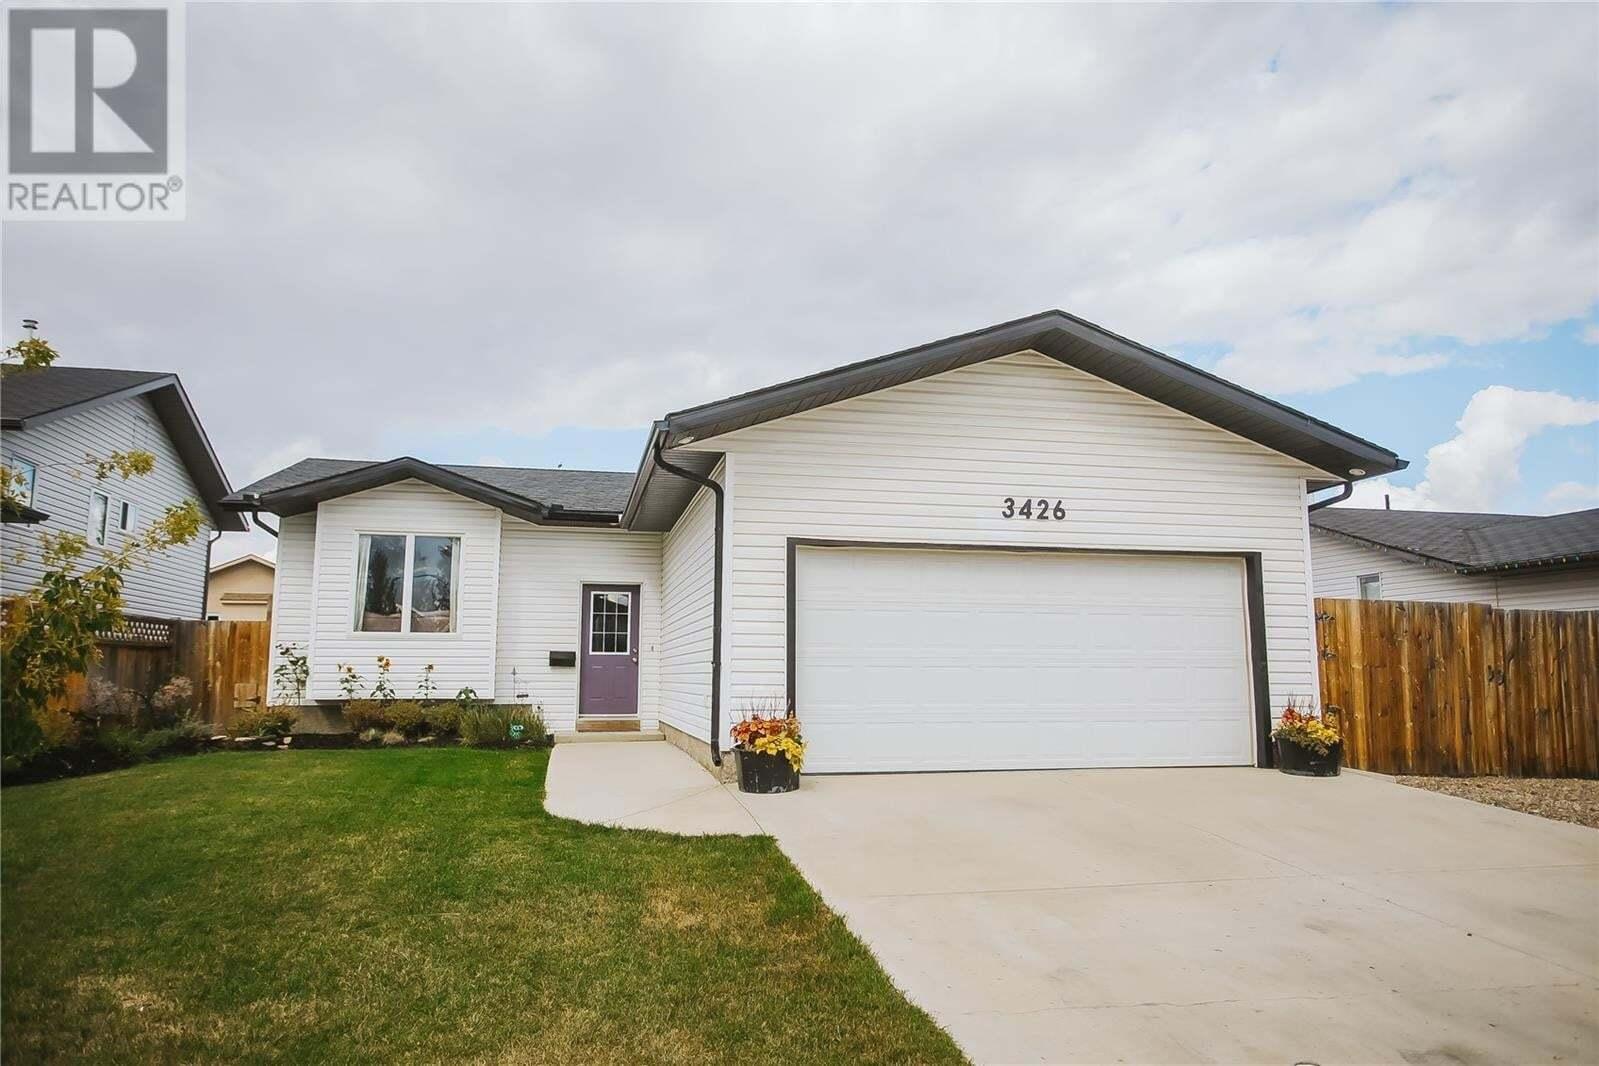 House for sale at 3426 37th St W Saskatoon Saskatchewan - MLS: SK826460